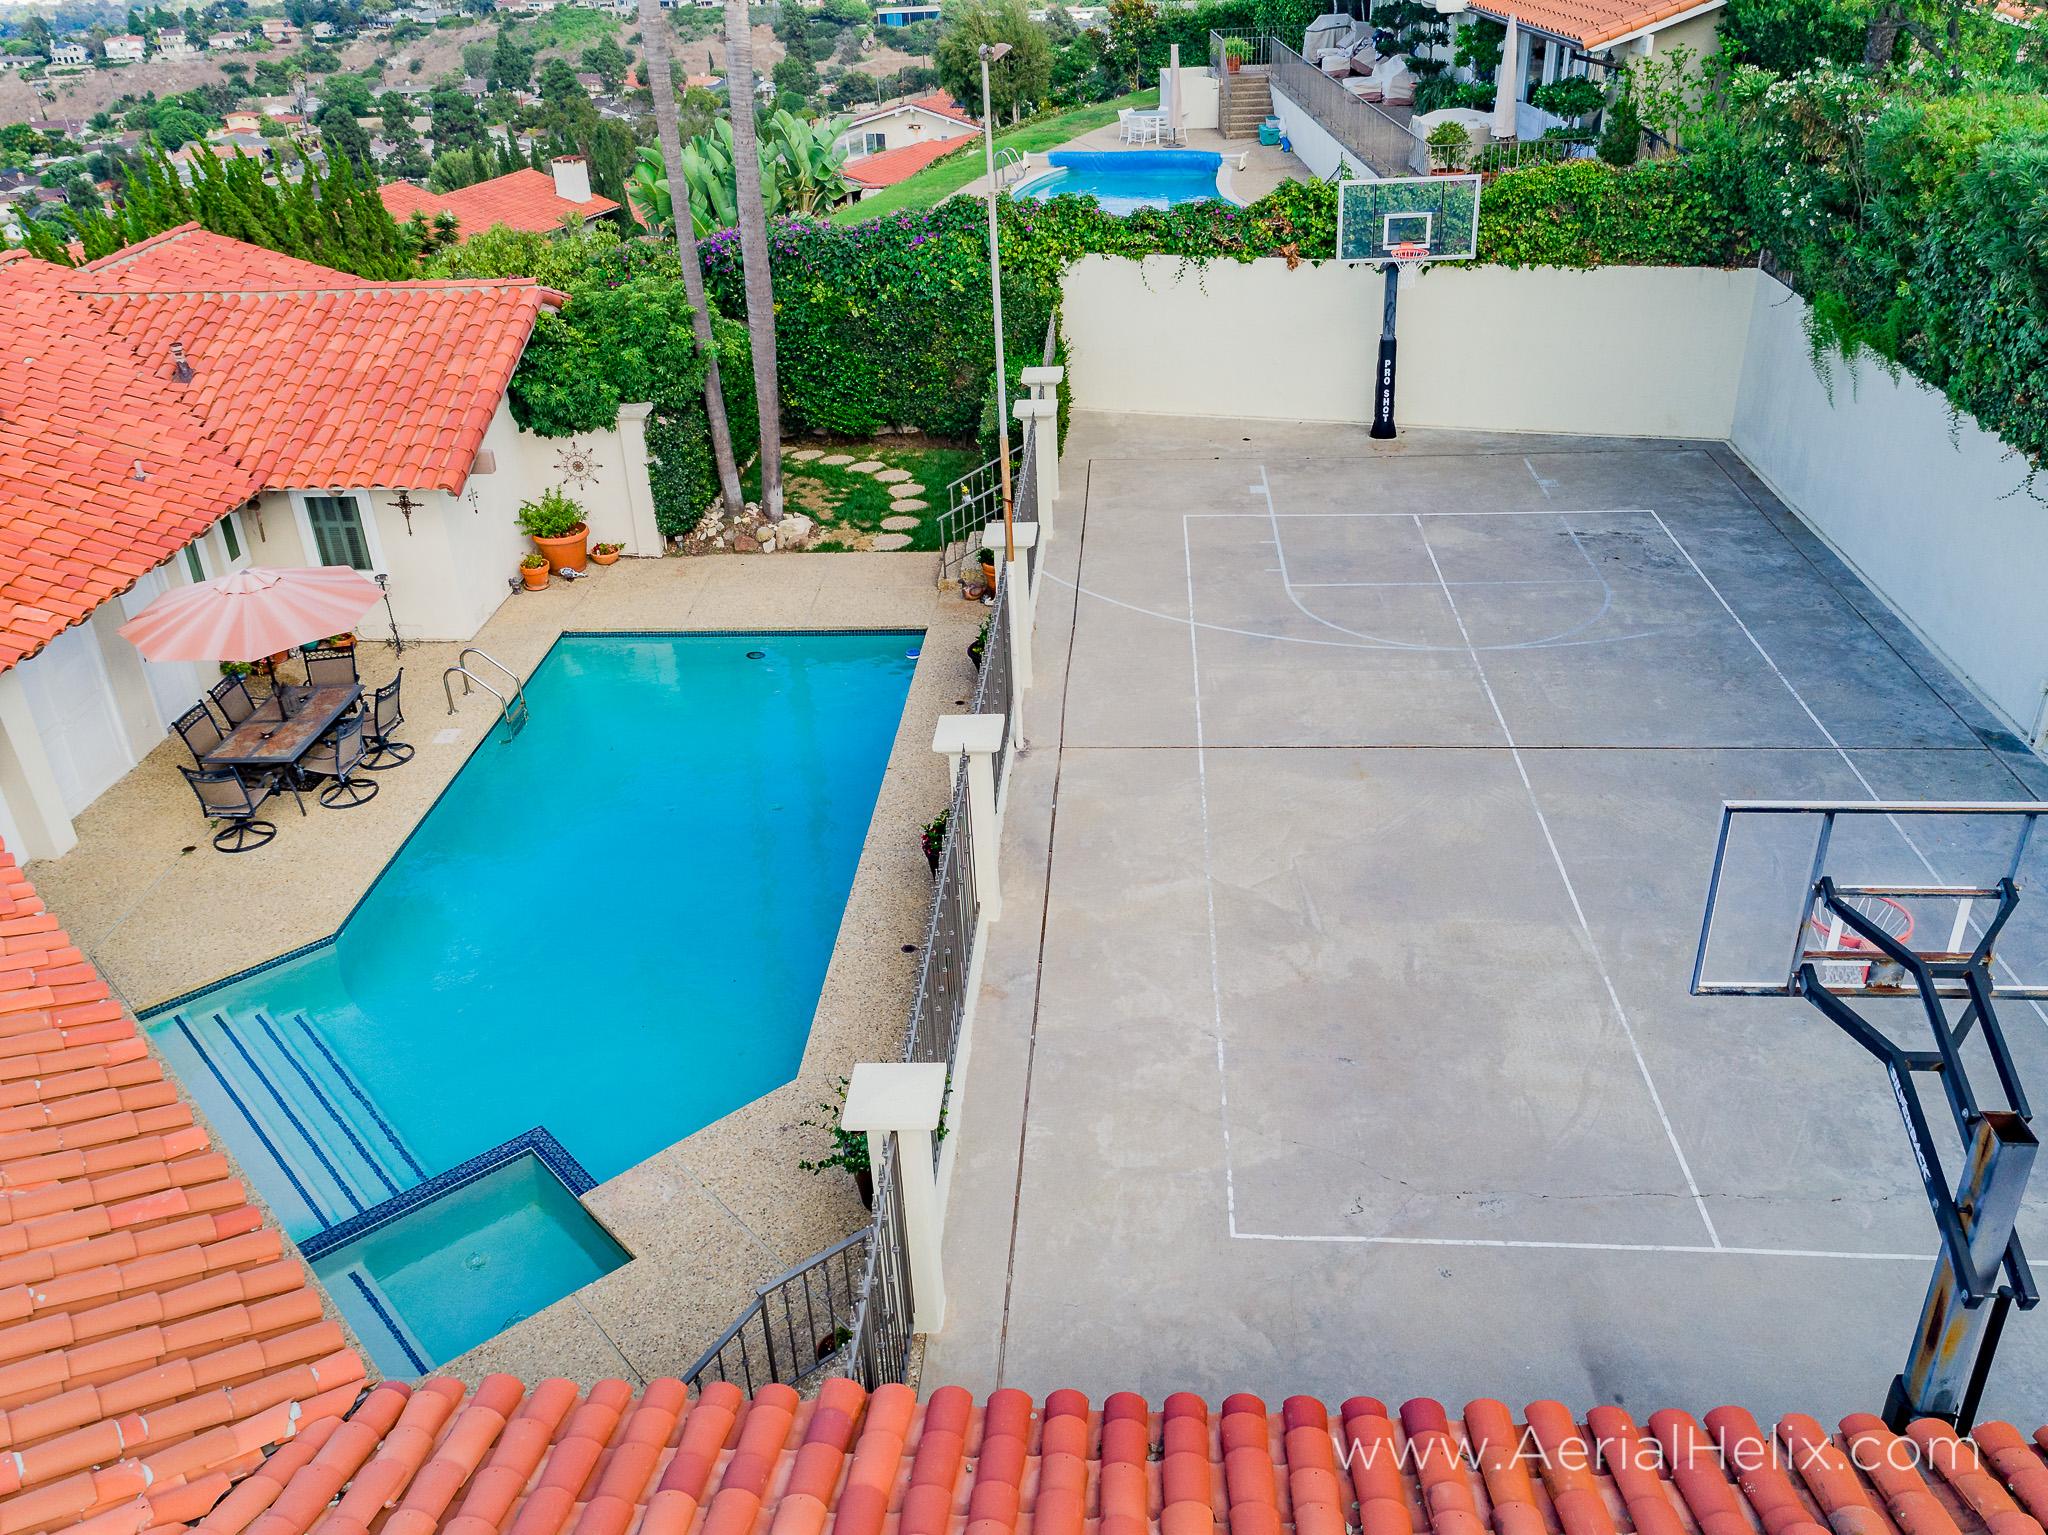 Woodfern Drive - HELIX Real Estate Aerial Photographer-16.jpg